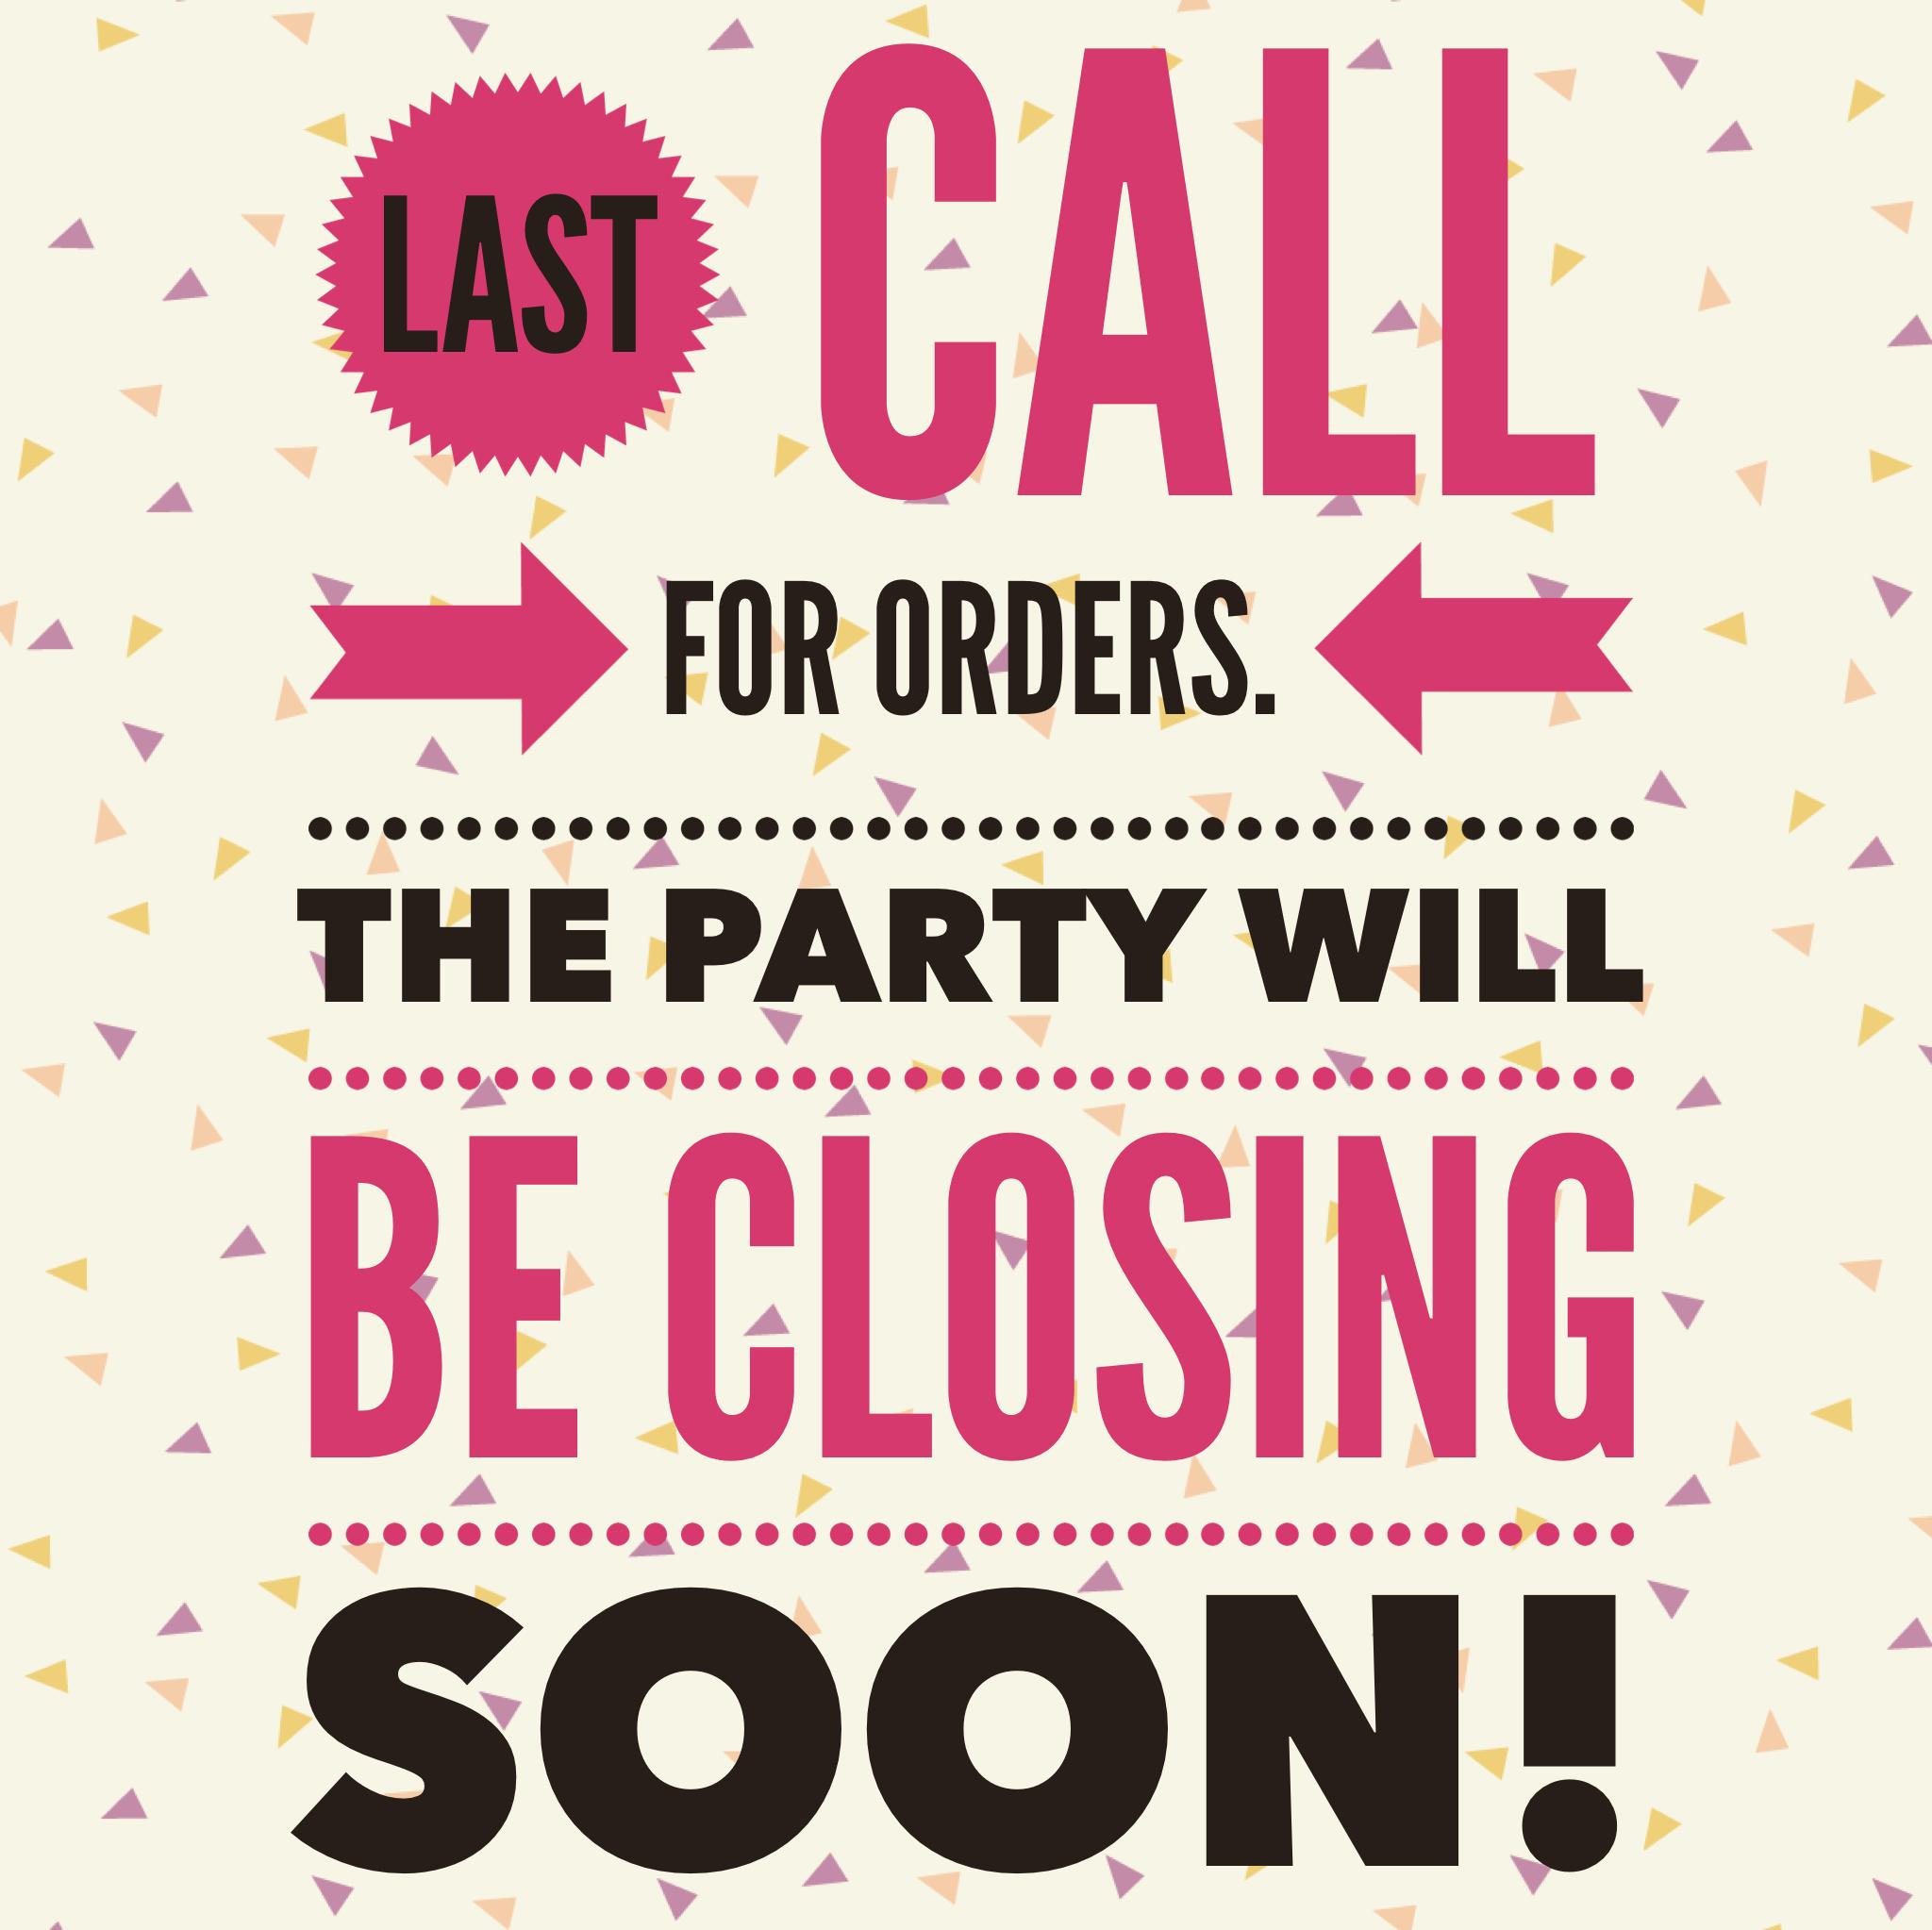 last call for orders LuLaRoe Pinterest